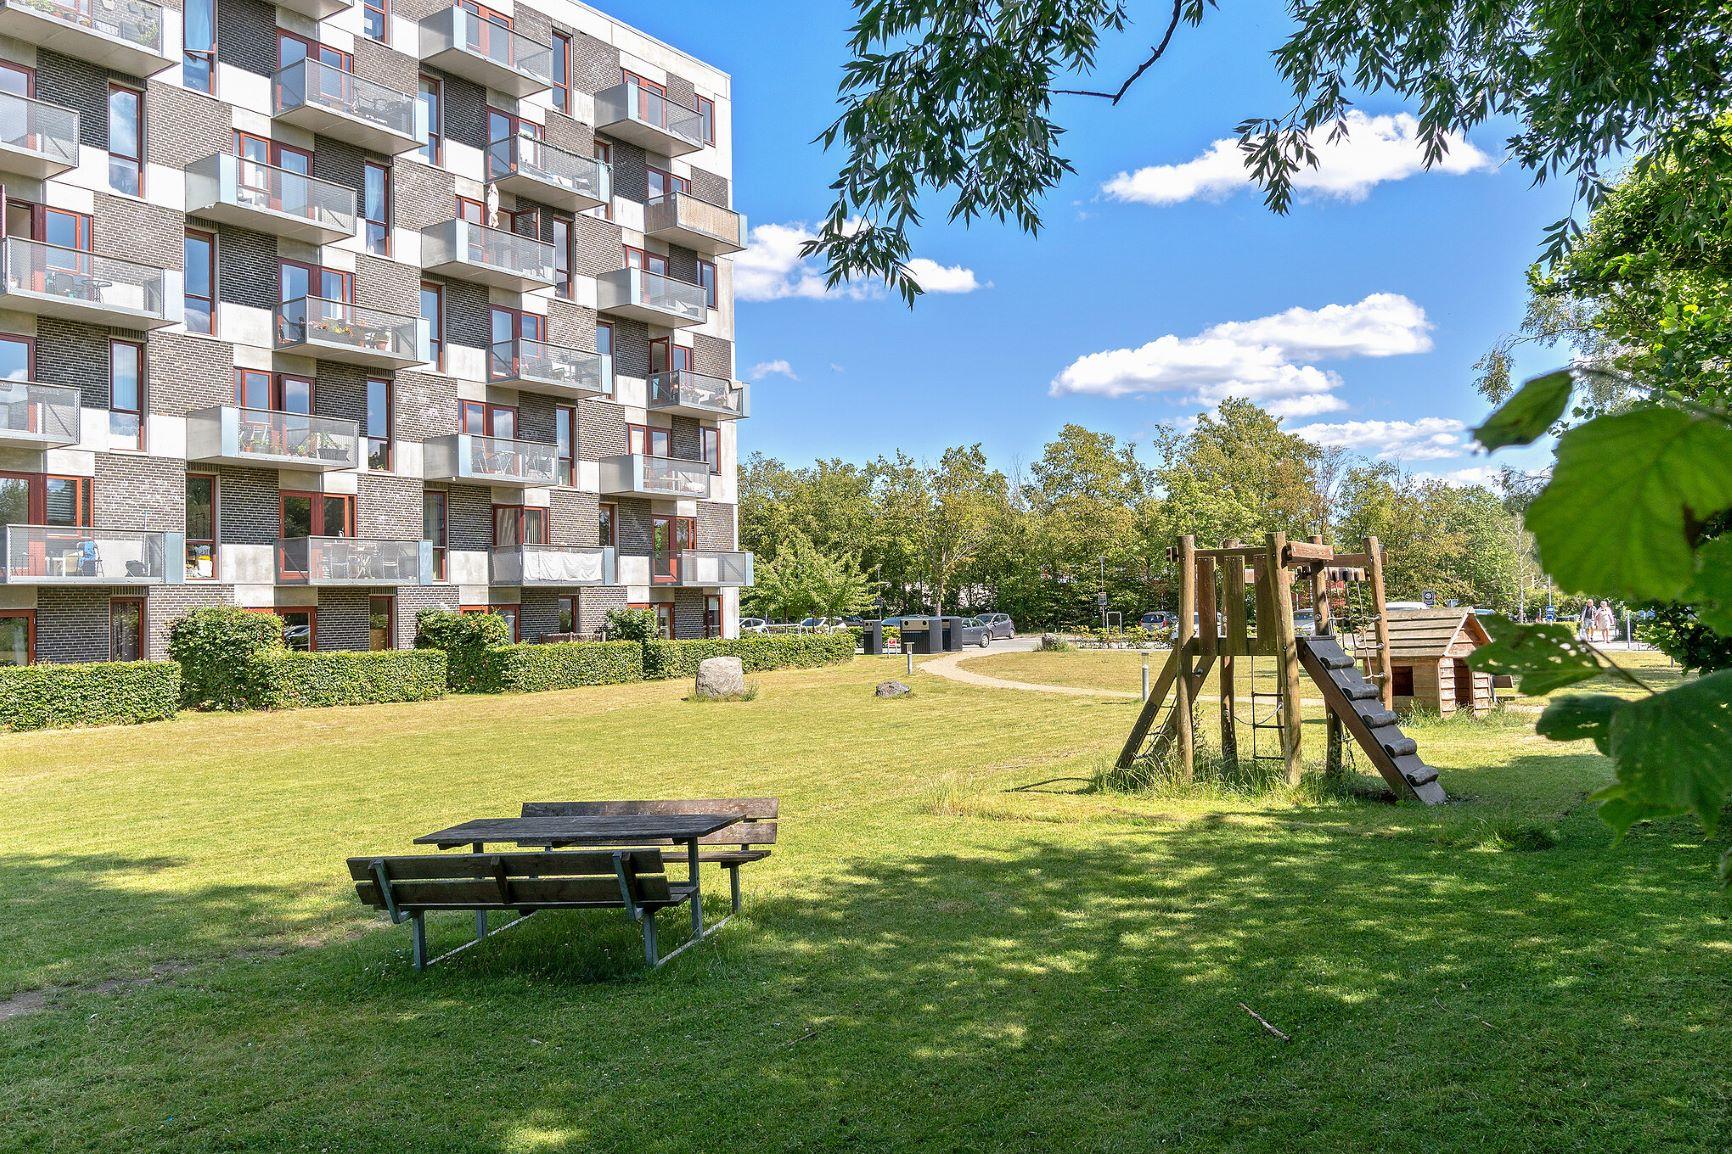 Lejebolig på Gyngemose Parkvej 57, 5. th., 2860 Søborg